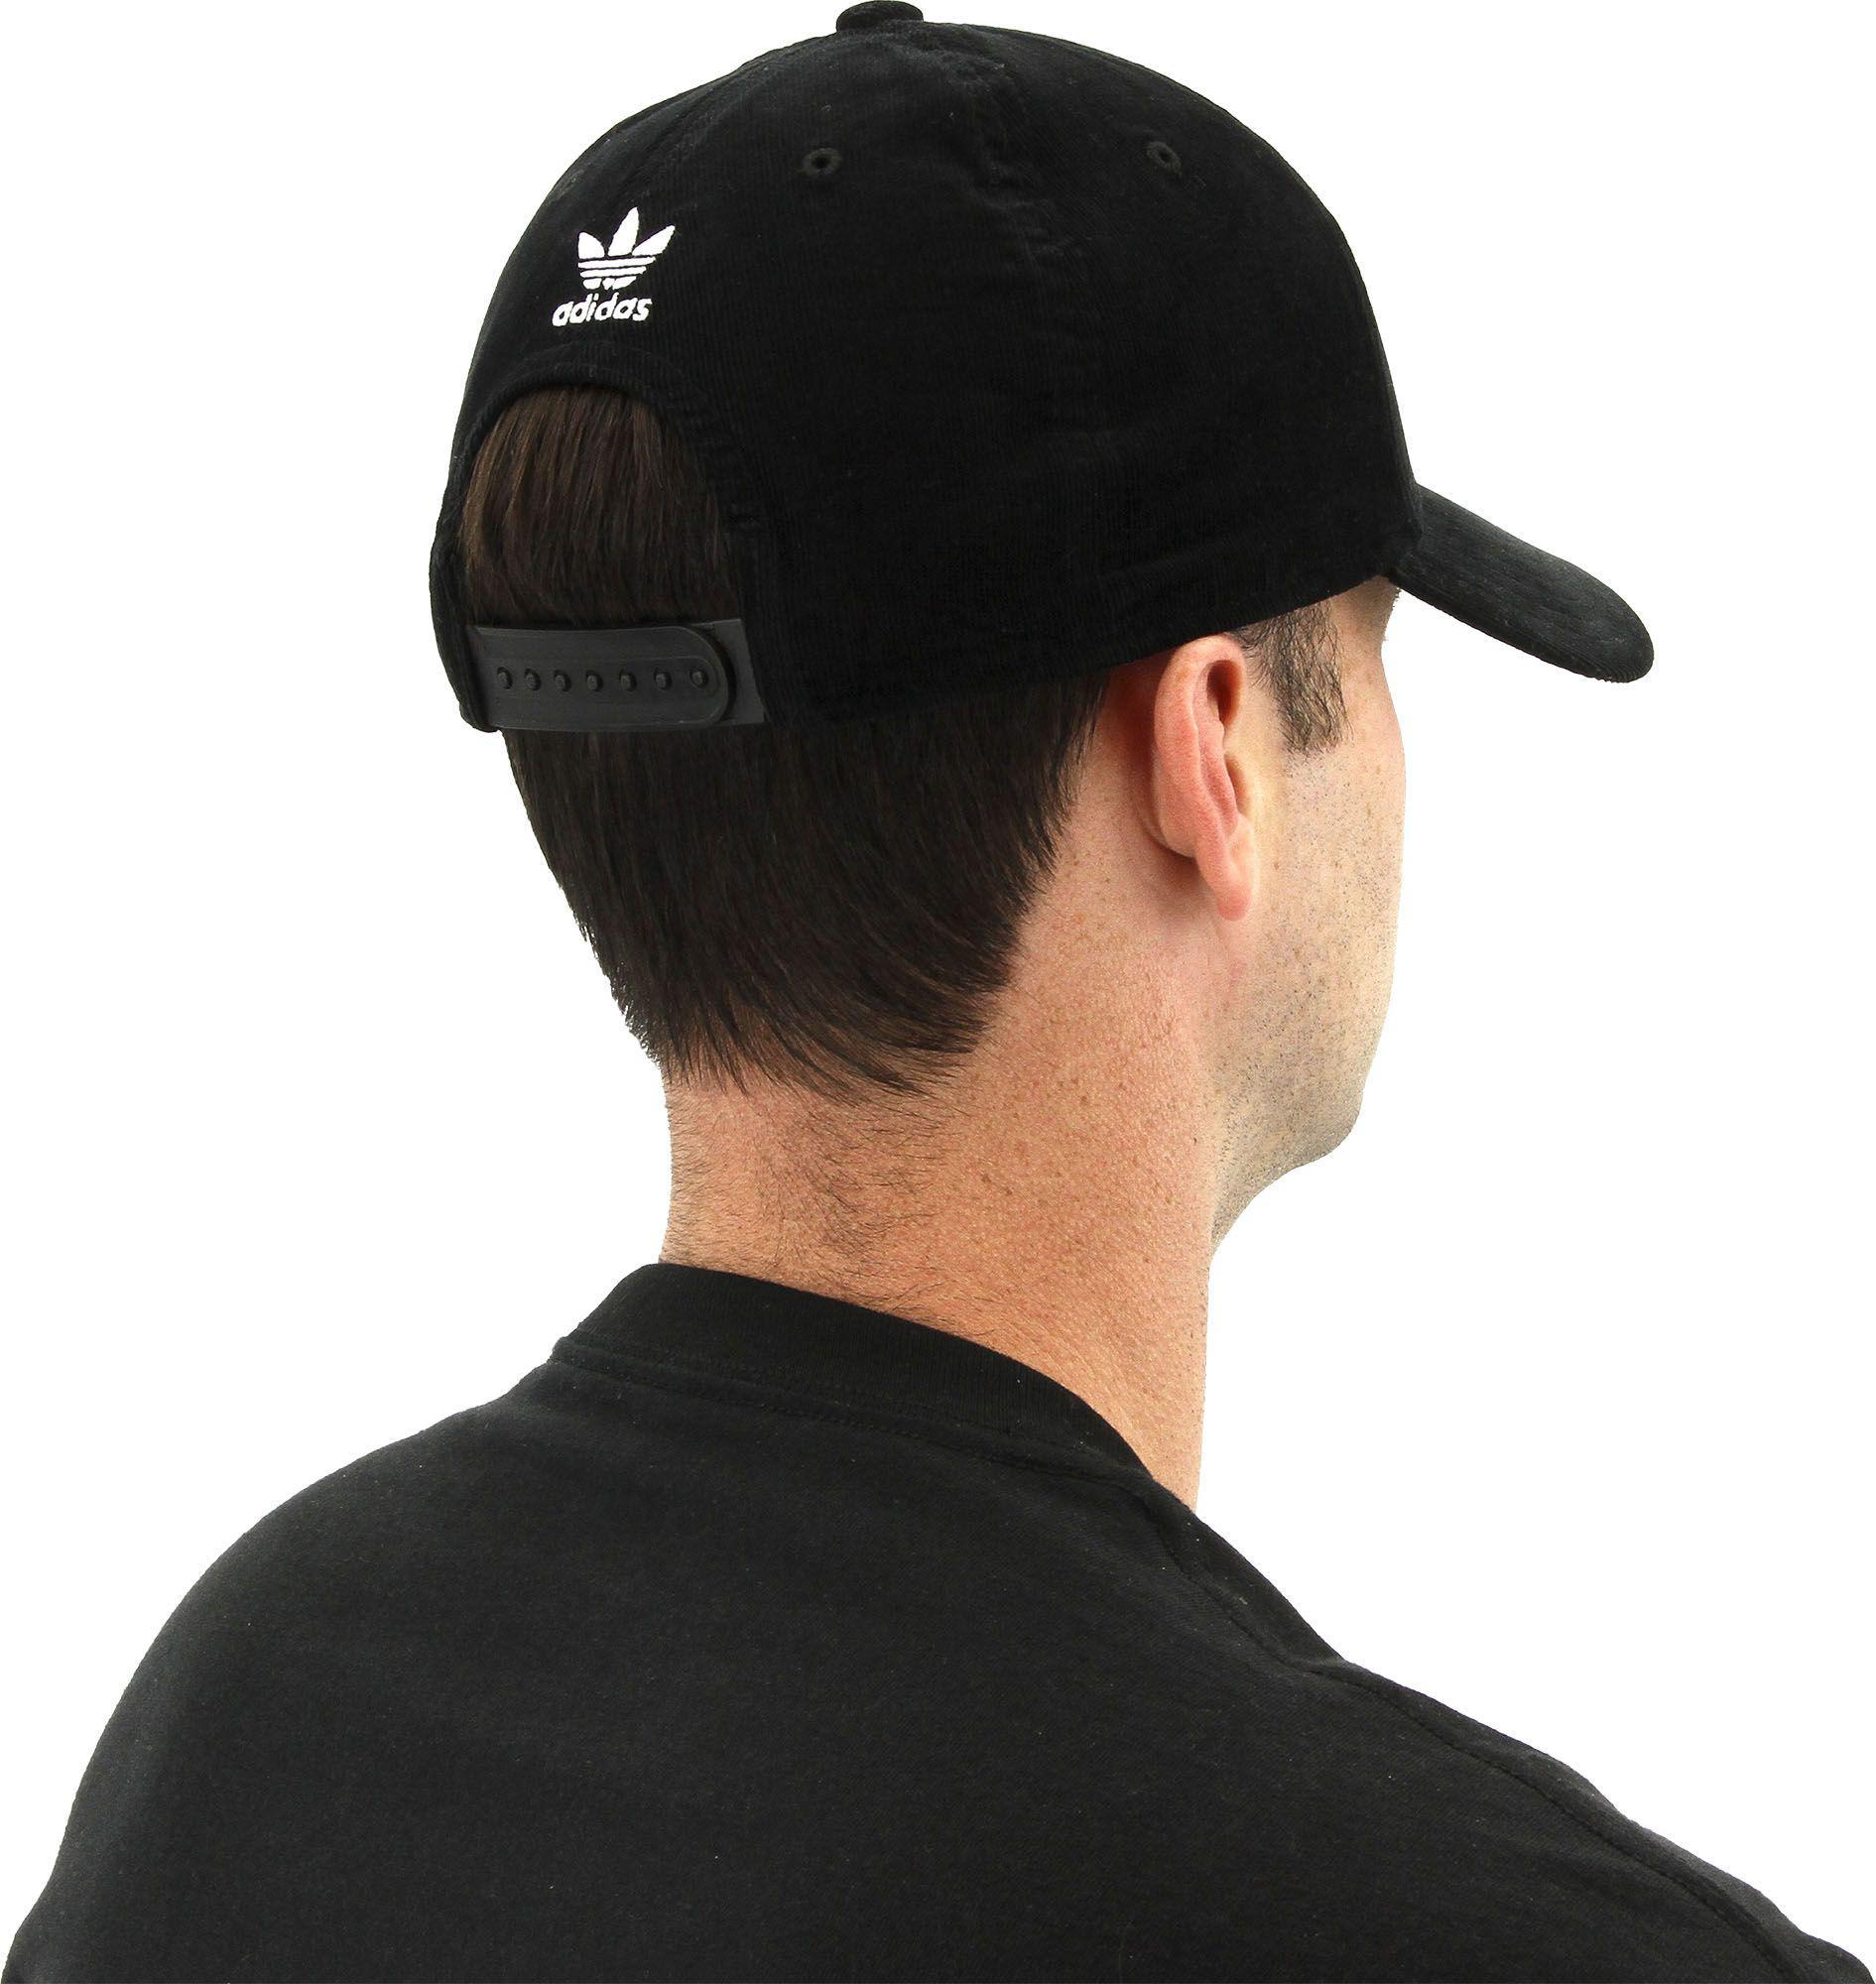 046bcc3024981 ... caps sports outdoors tibs 3c2ef 40719  low cost lyst adidas originals  trefoil plus precurve hat in black for men d2f90 63f0e